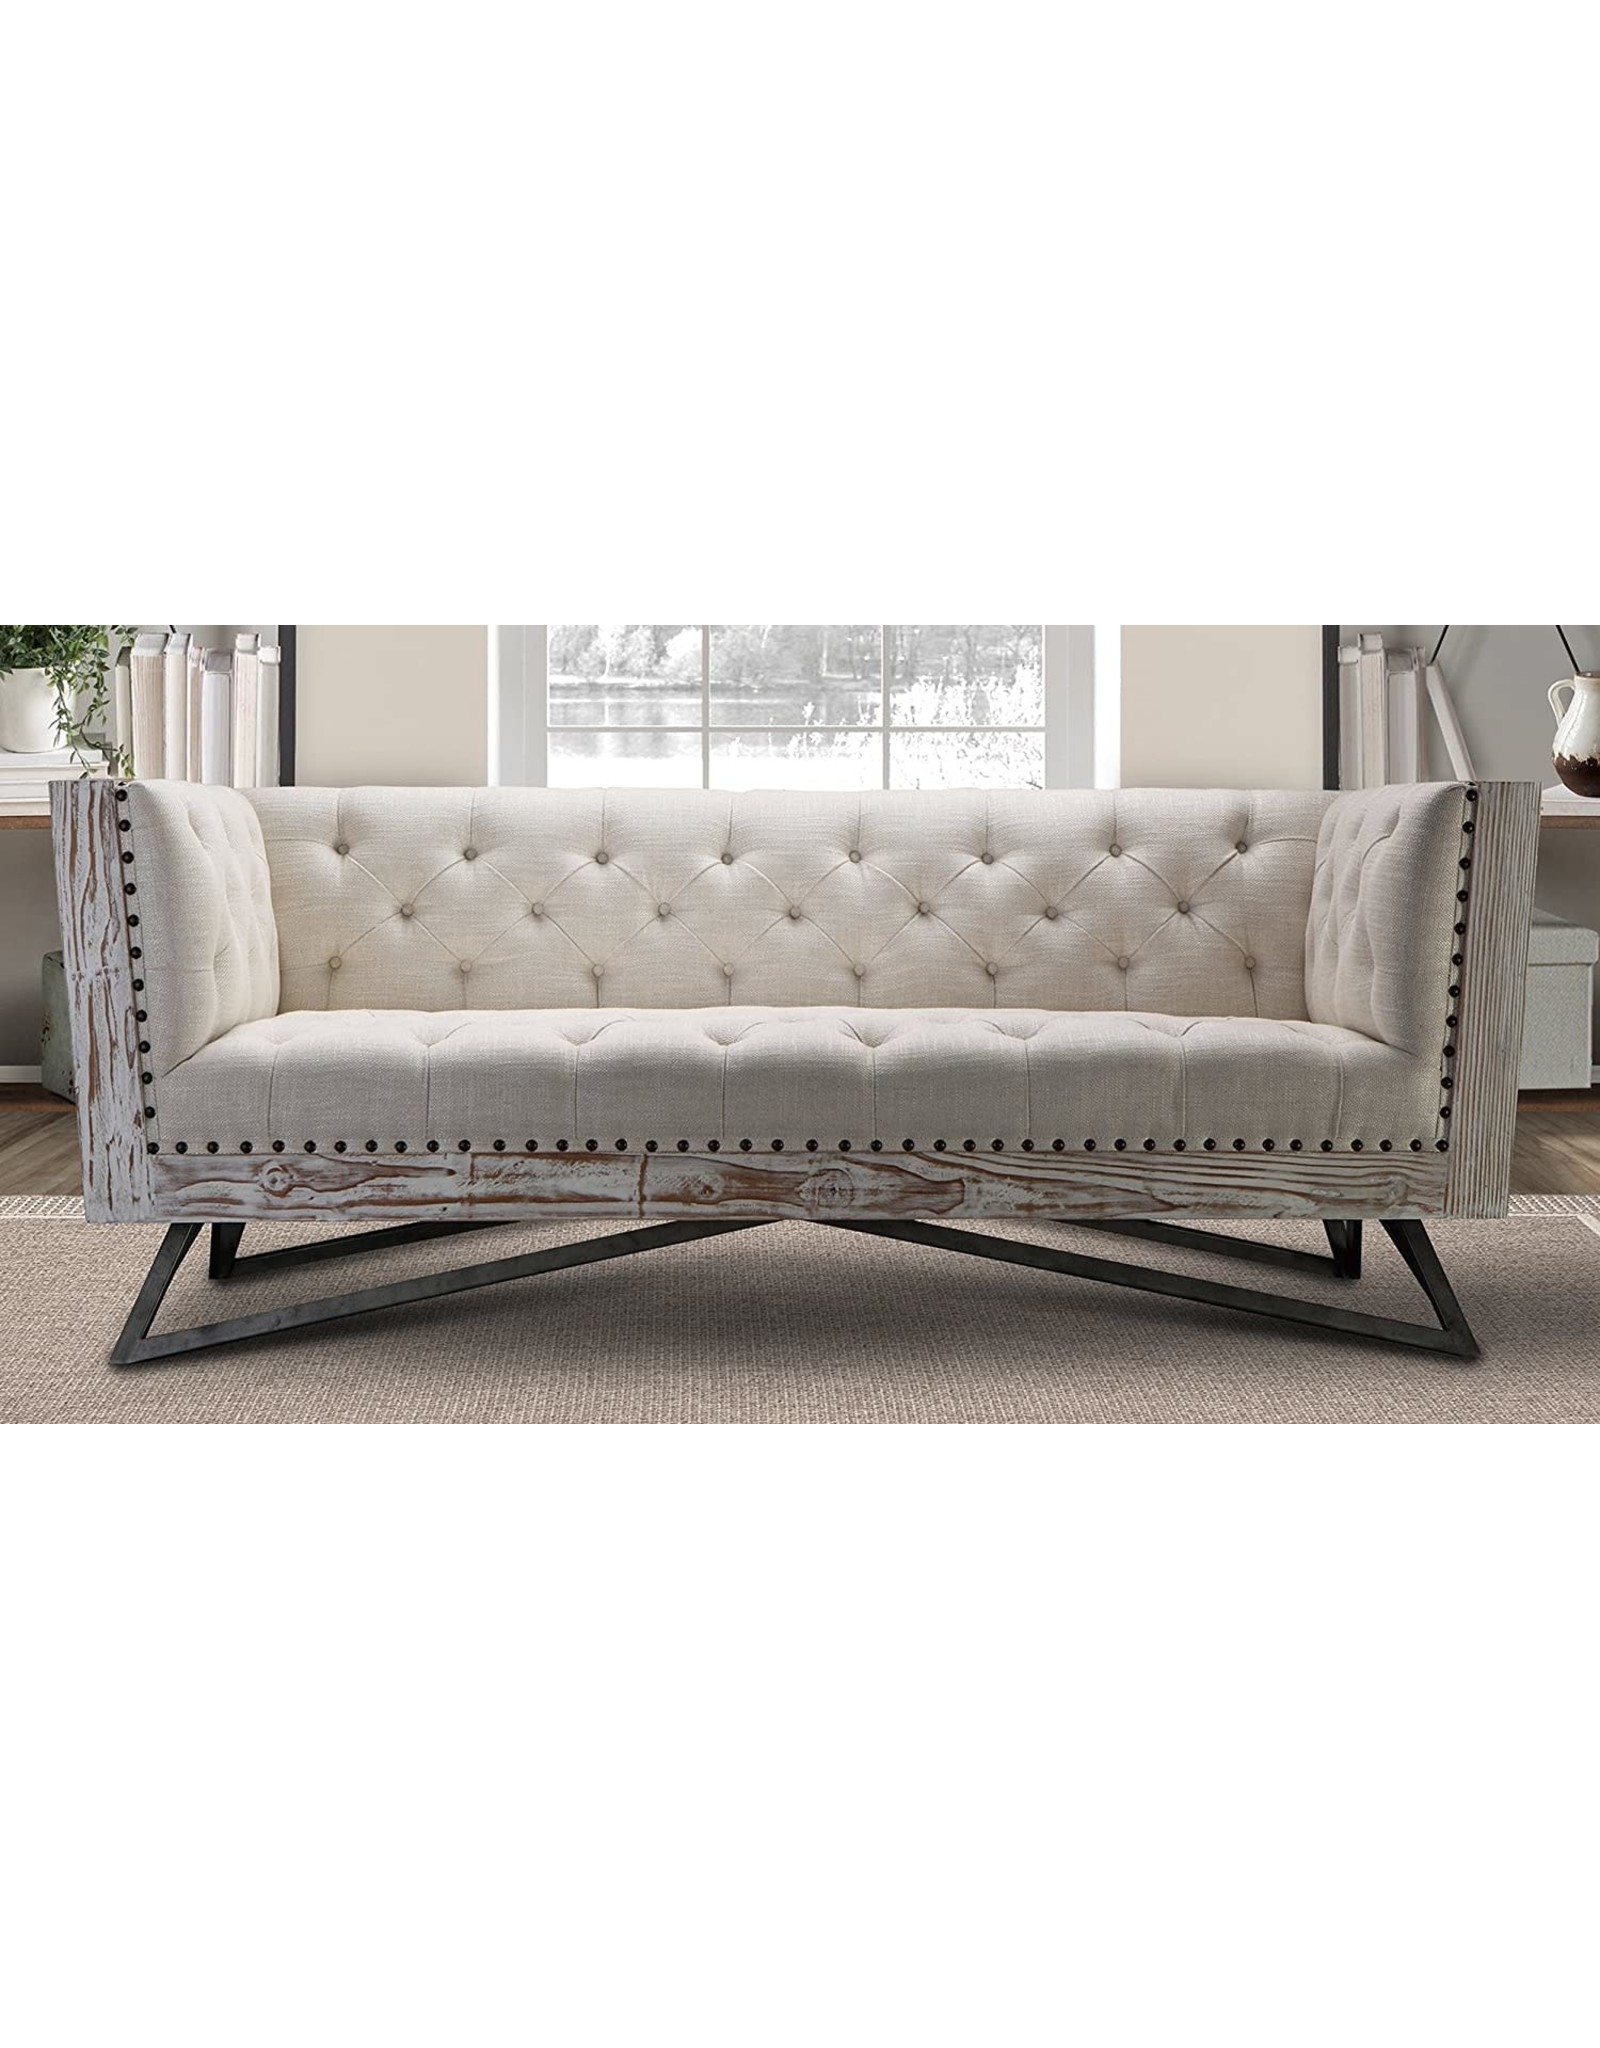 Armen Living Armen Living Regis Sofa in Cream and Gunmetal Finish